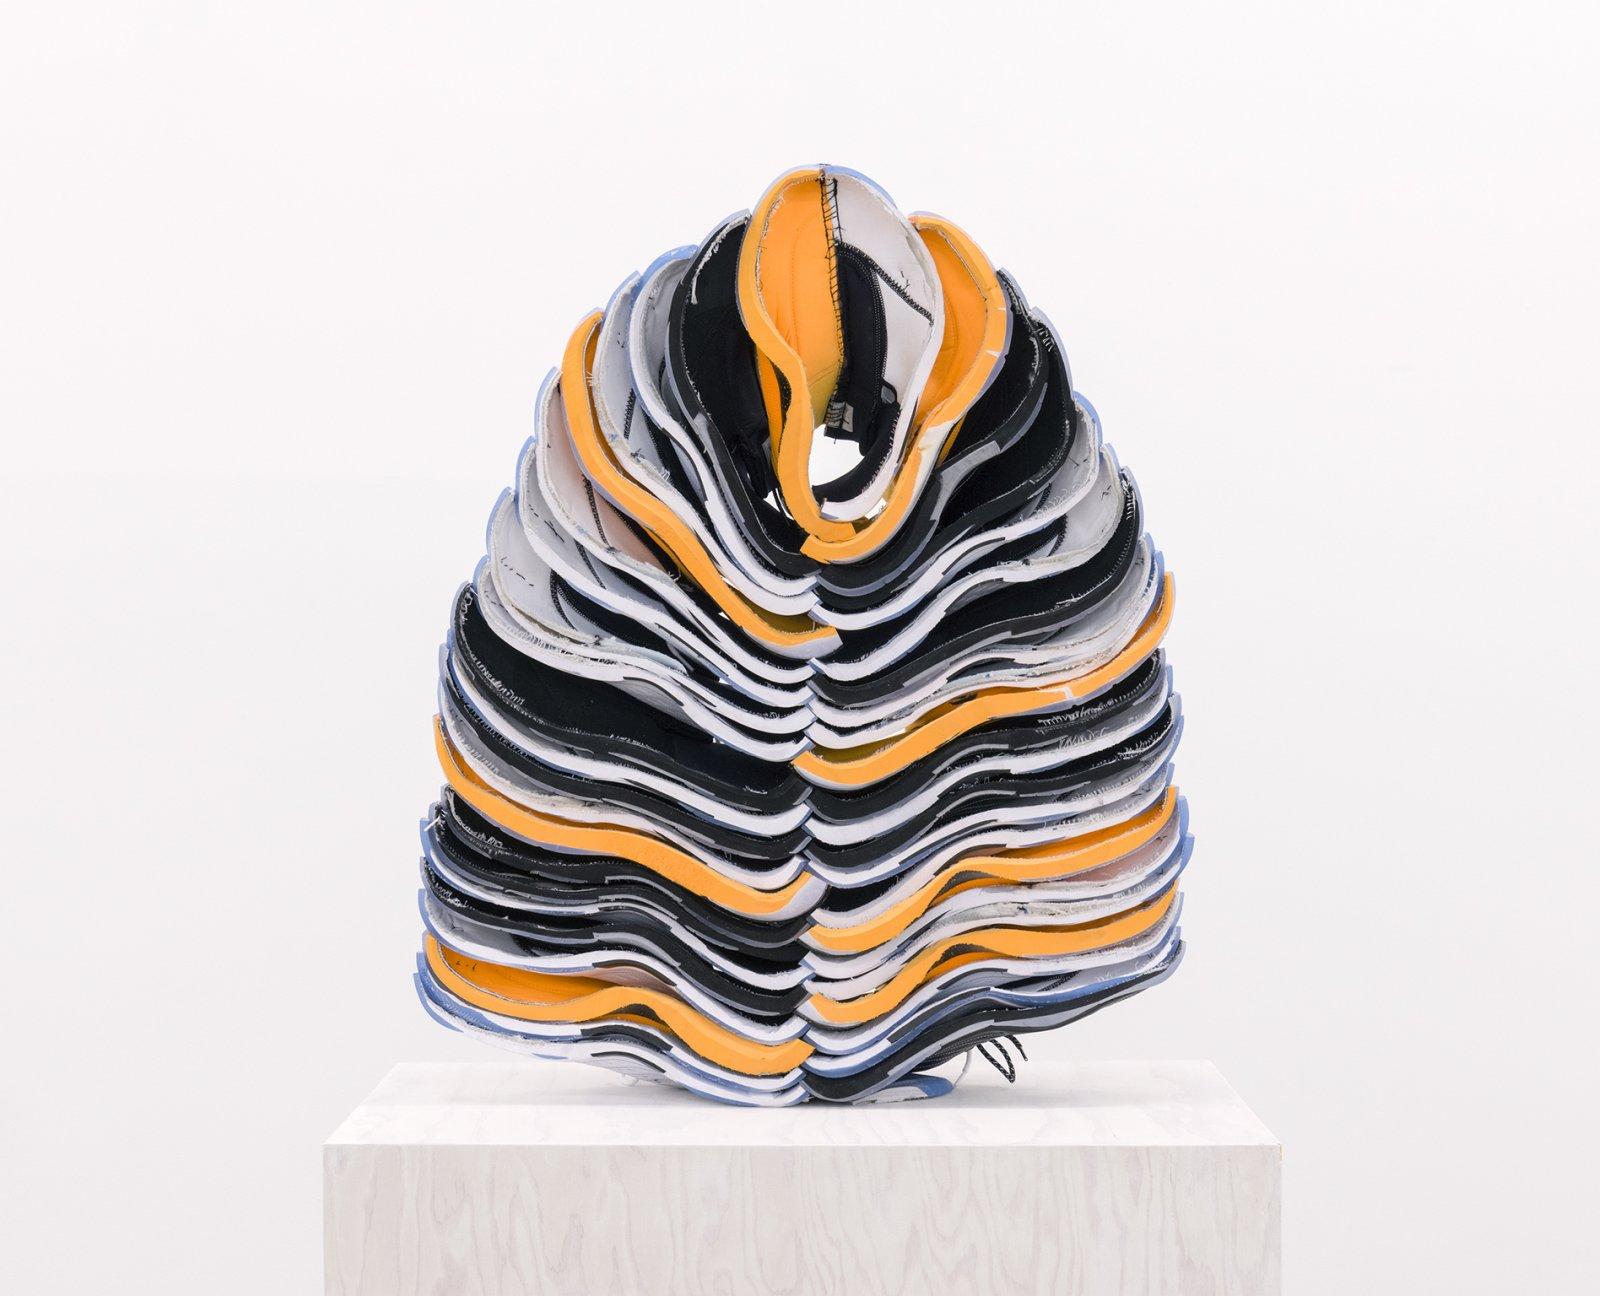 Brian Jungen, Lay Down Tender Fire (detail), 2015–2016, nike air jordans, painted fir plywood, stainless steel, 100 x 17 x 24 in. (254 x 43 x 61 cm) by Brian Jungen